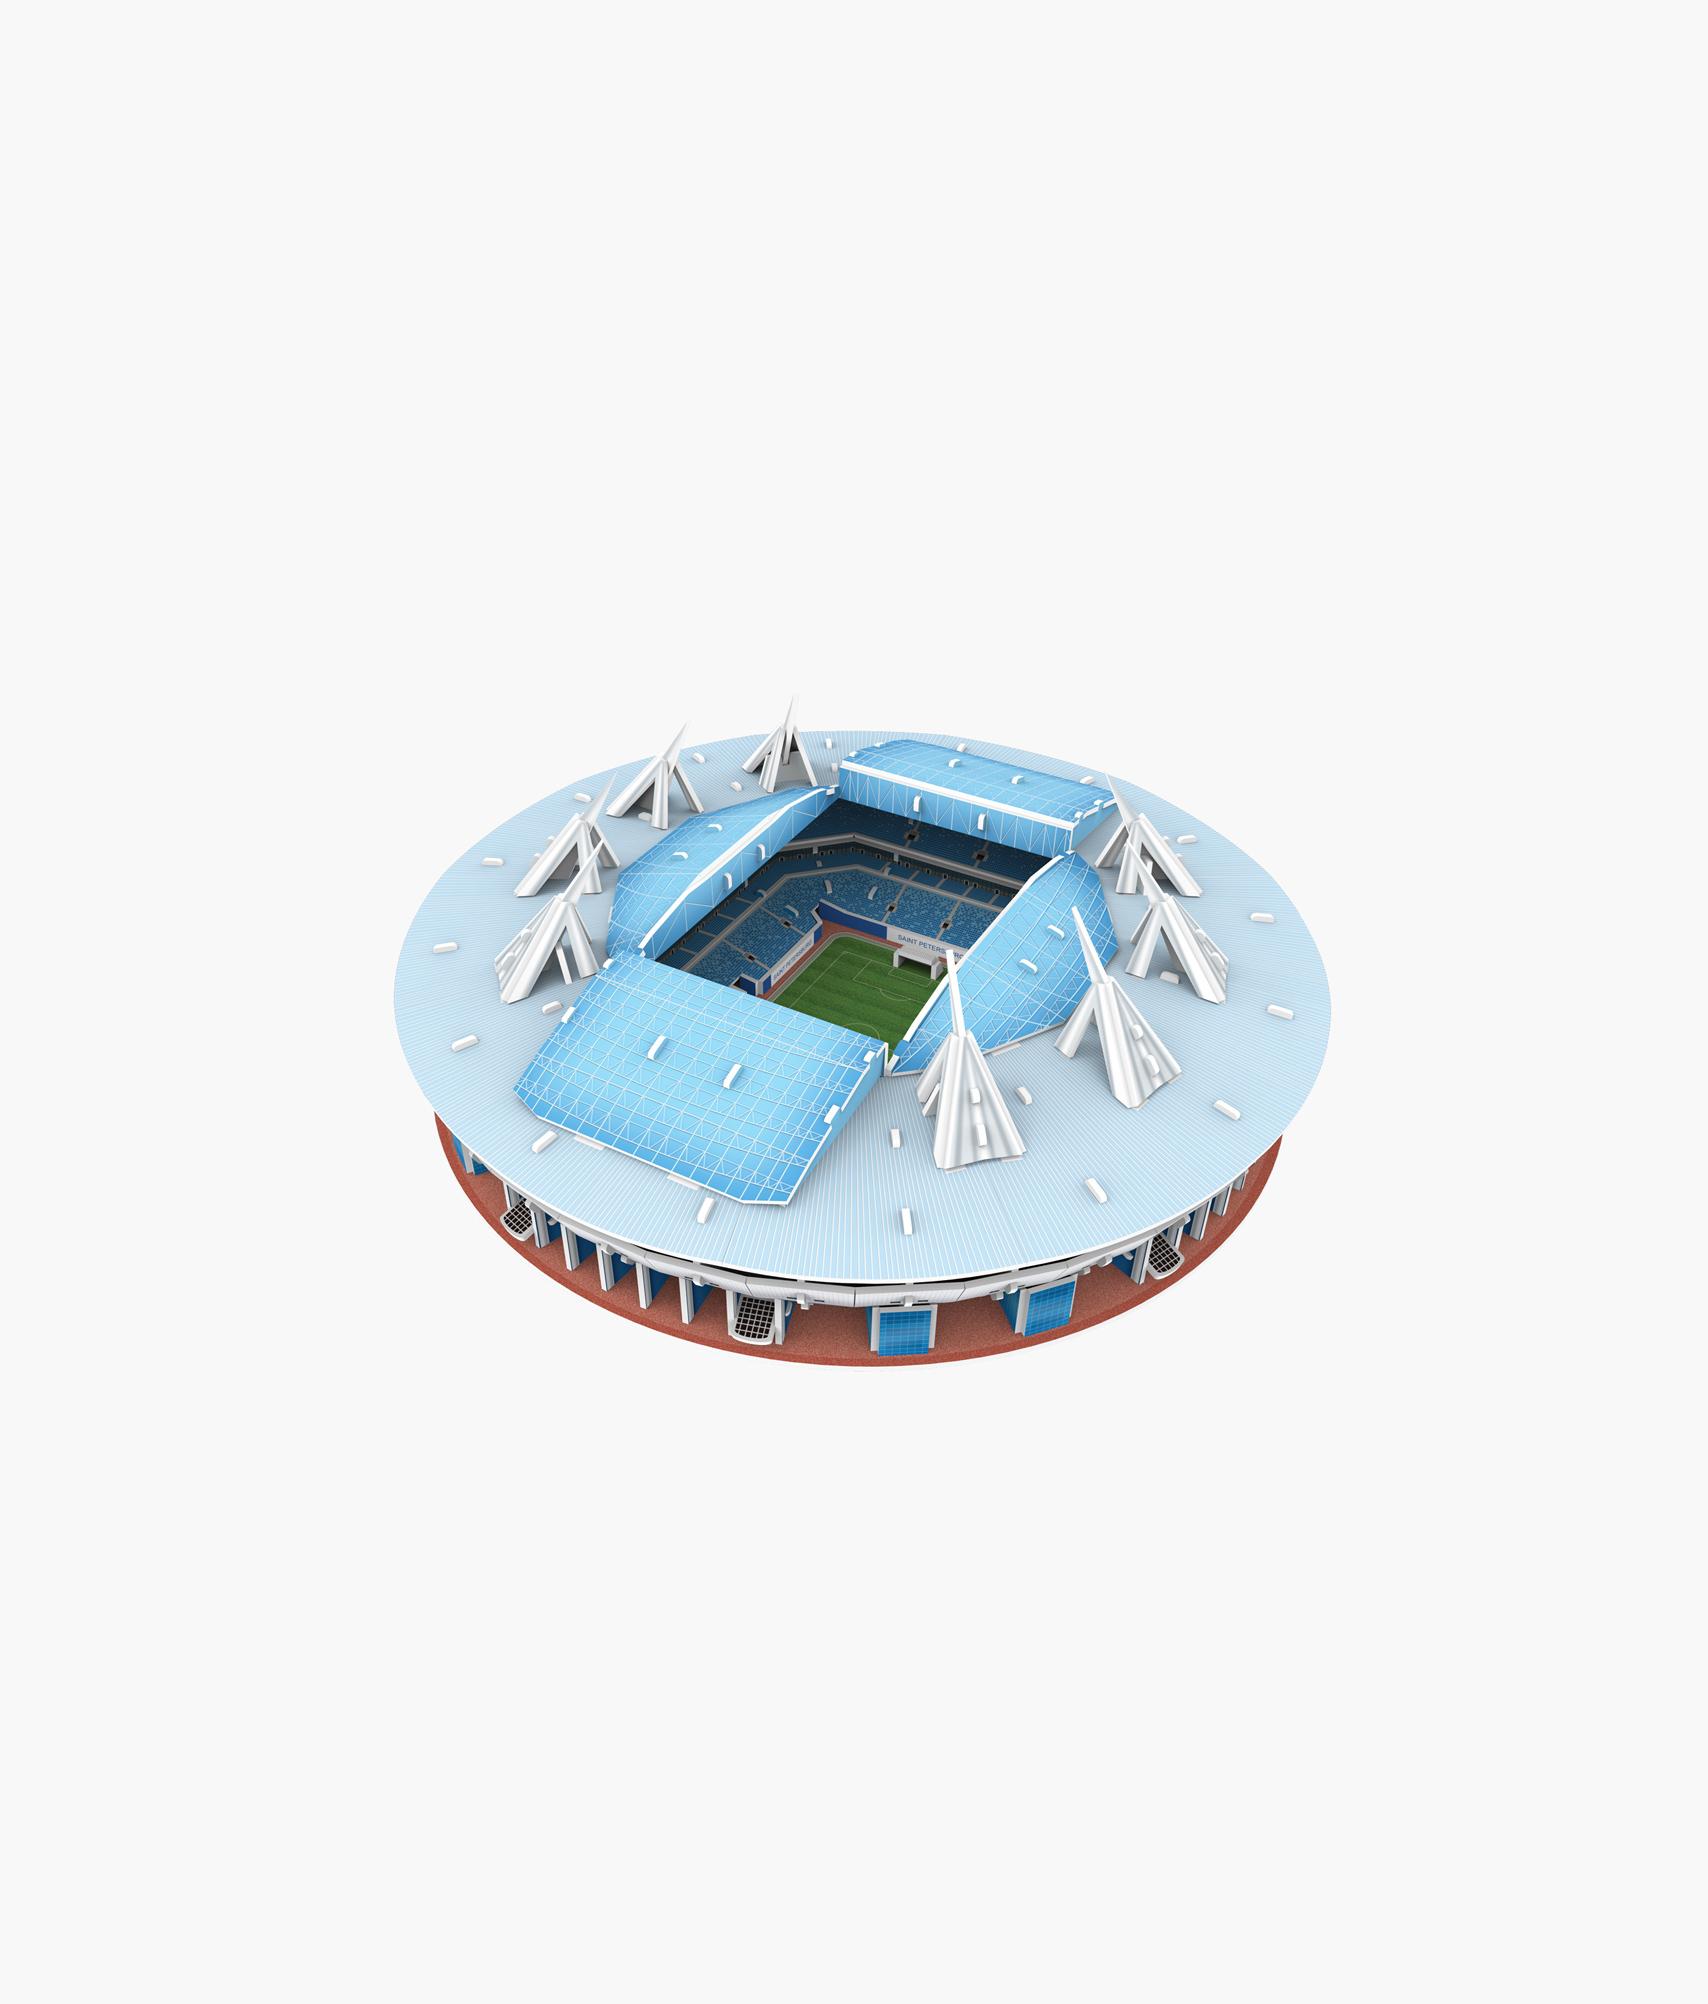 Пазл 3D Стадион «Санкт-Петербург» Зенит сувенир акм плакетка санкт петербург ночь 4 шт